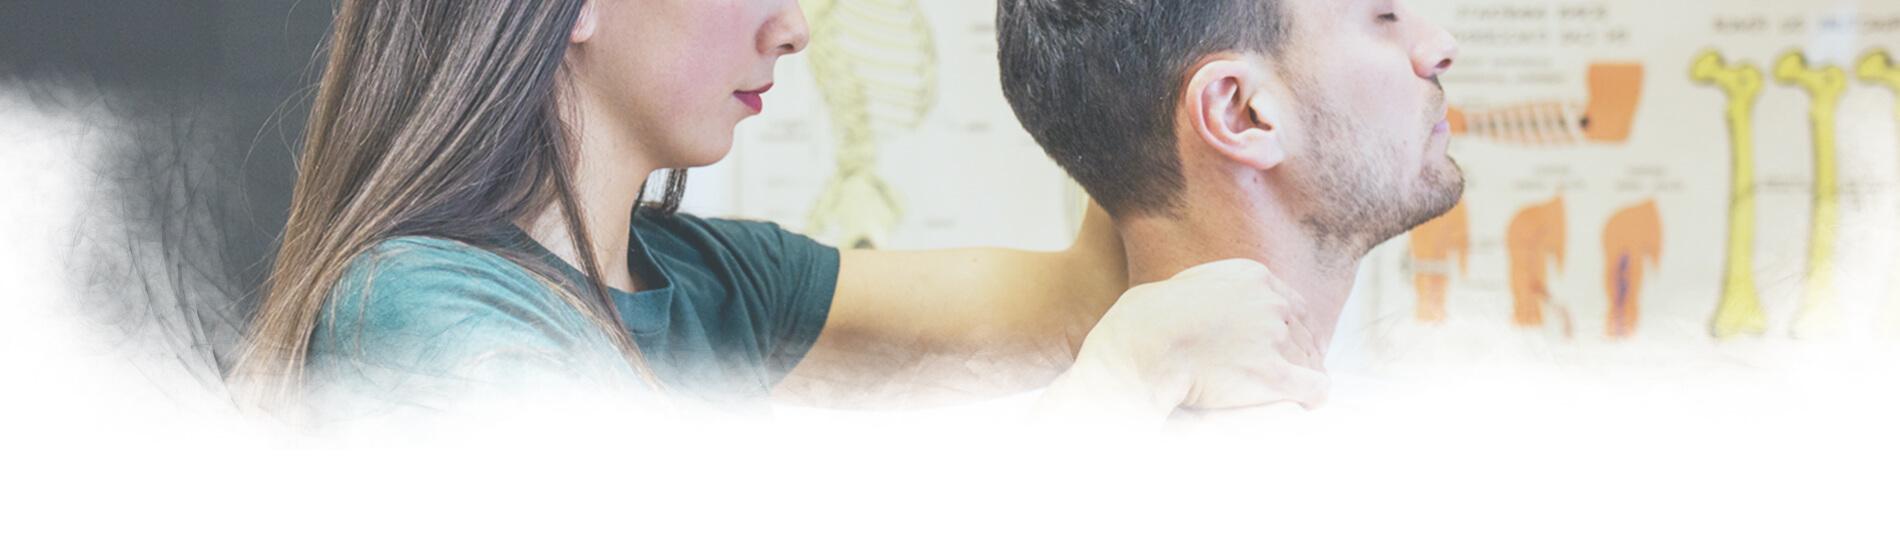 Margaux Vidal - Ostéopathe - Header Le métier